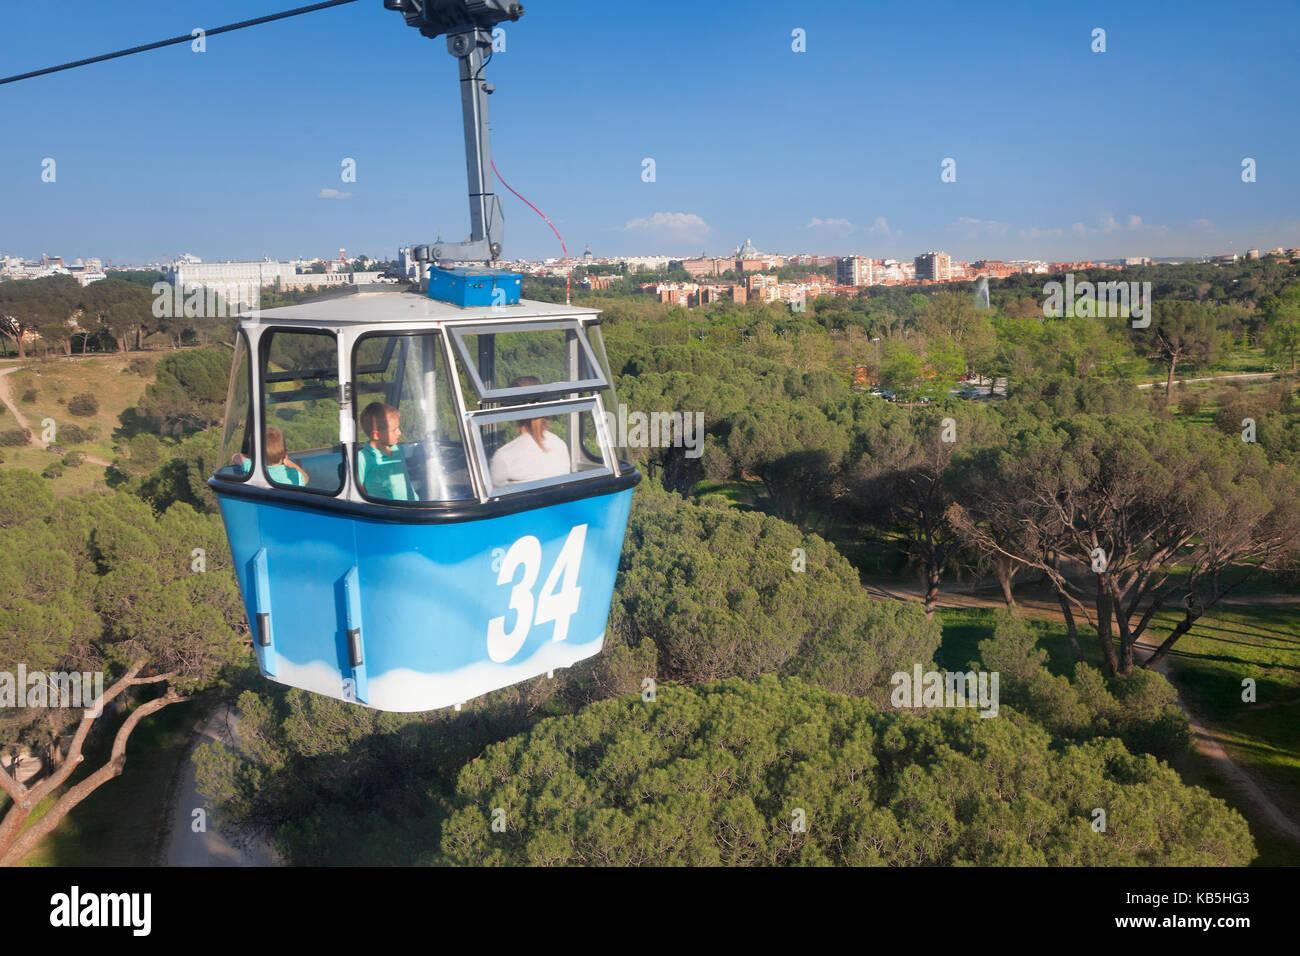 Teleferico, cable car, Casa de Campo Park, Madrid, Spain, Europe - Stock Image